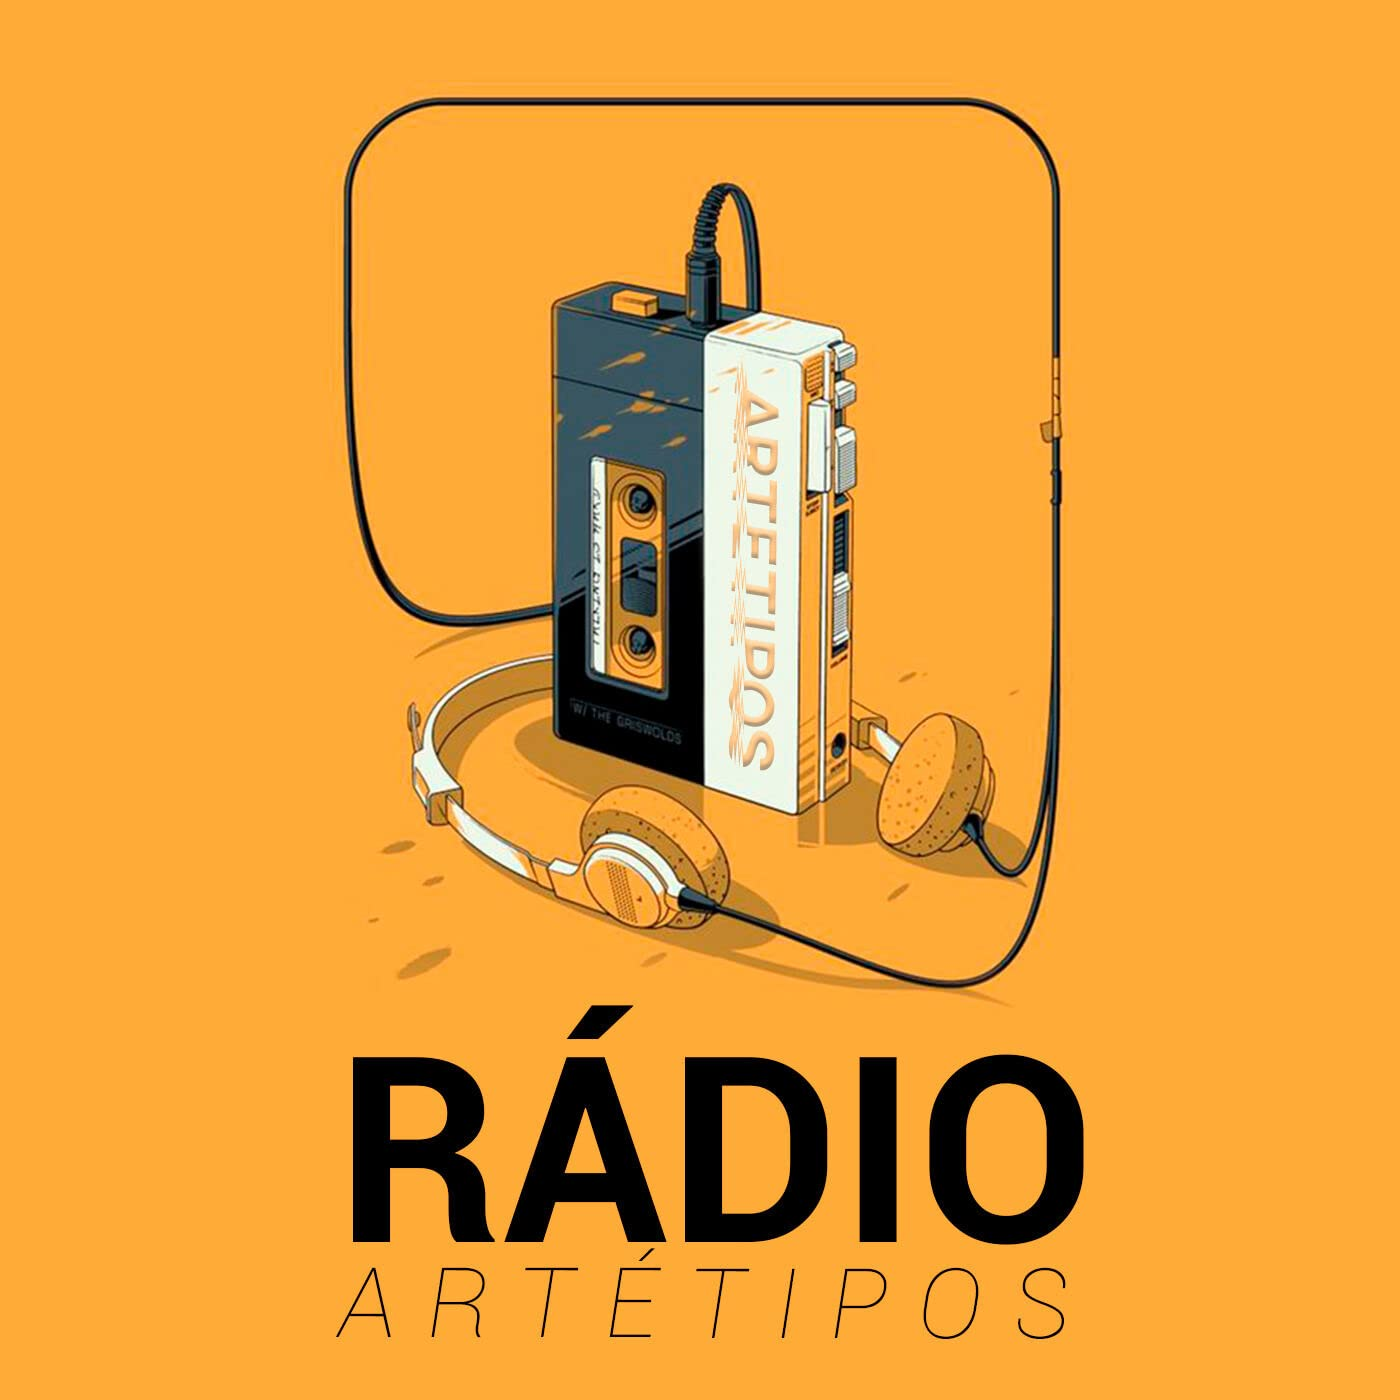 Rádio Artétipos